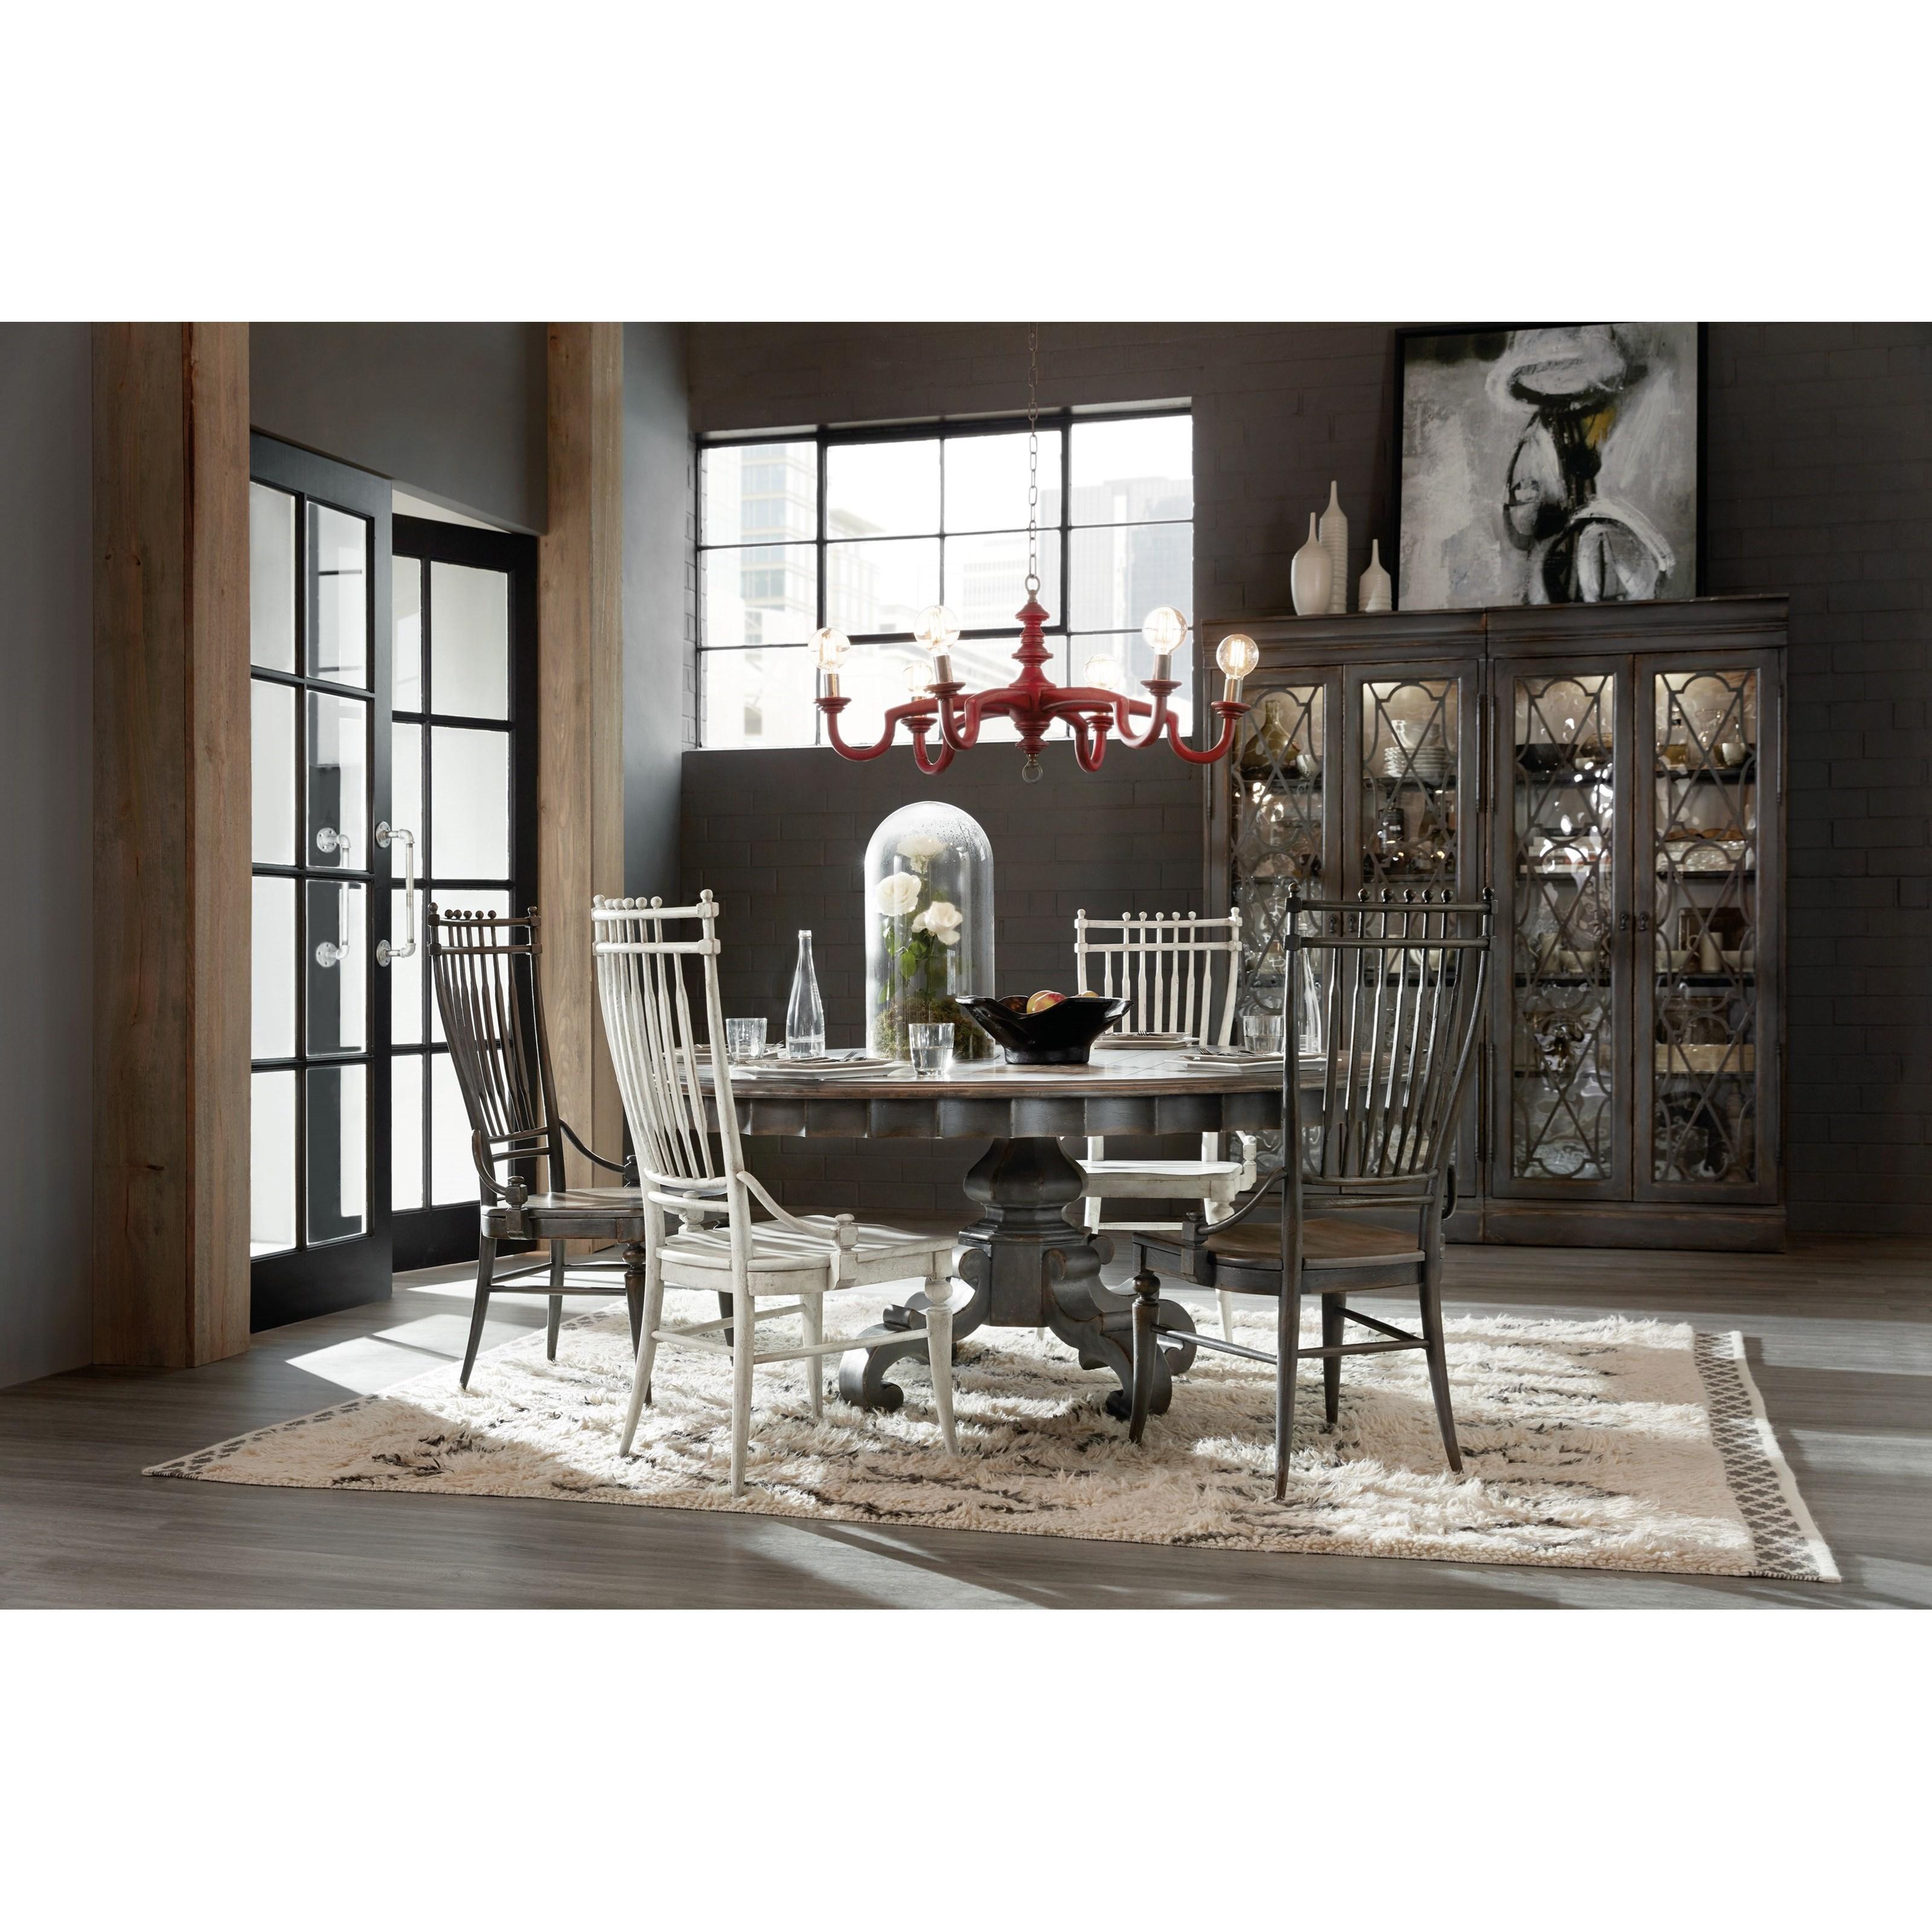 ... Hooker Furniture Arabella72in Round Pedestal Dining Table